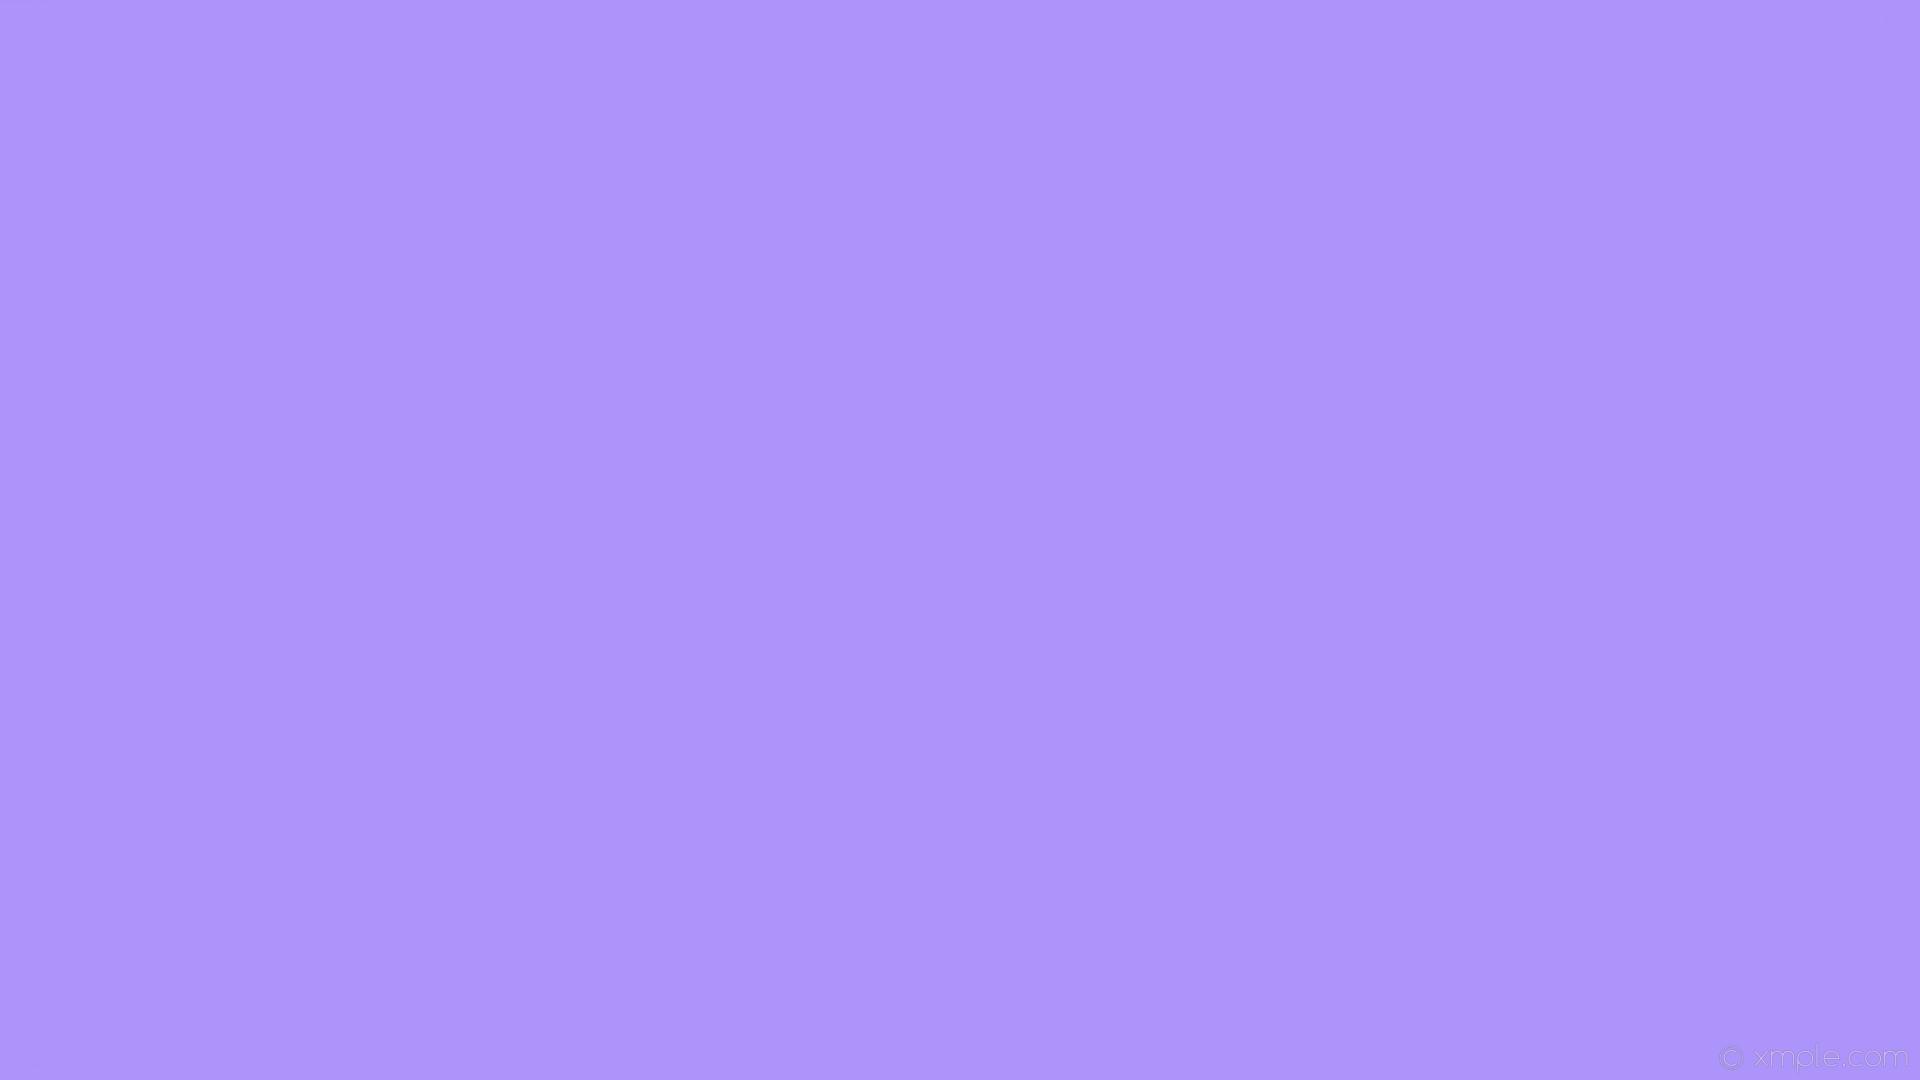 wallpaper plain blue single solid color one colour #ad94fa